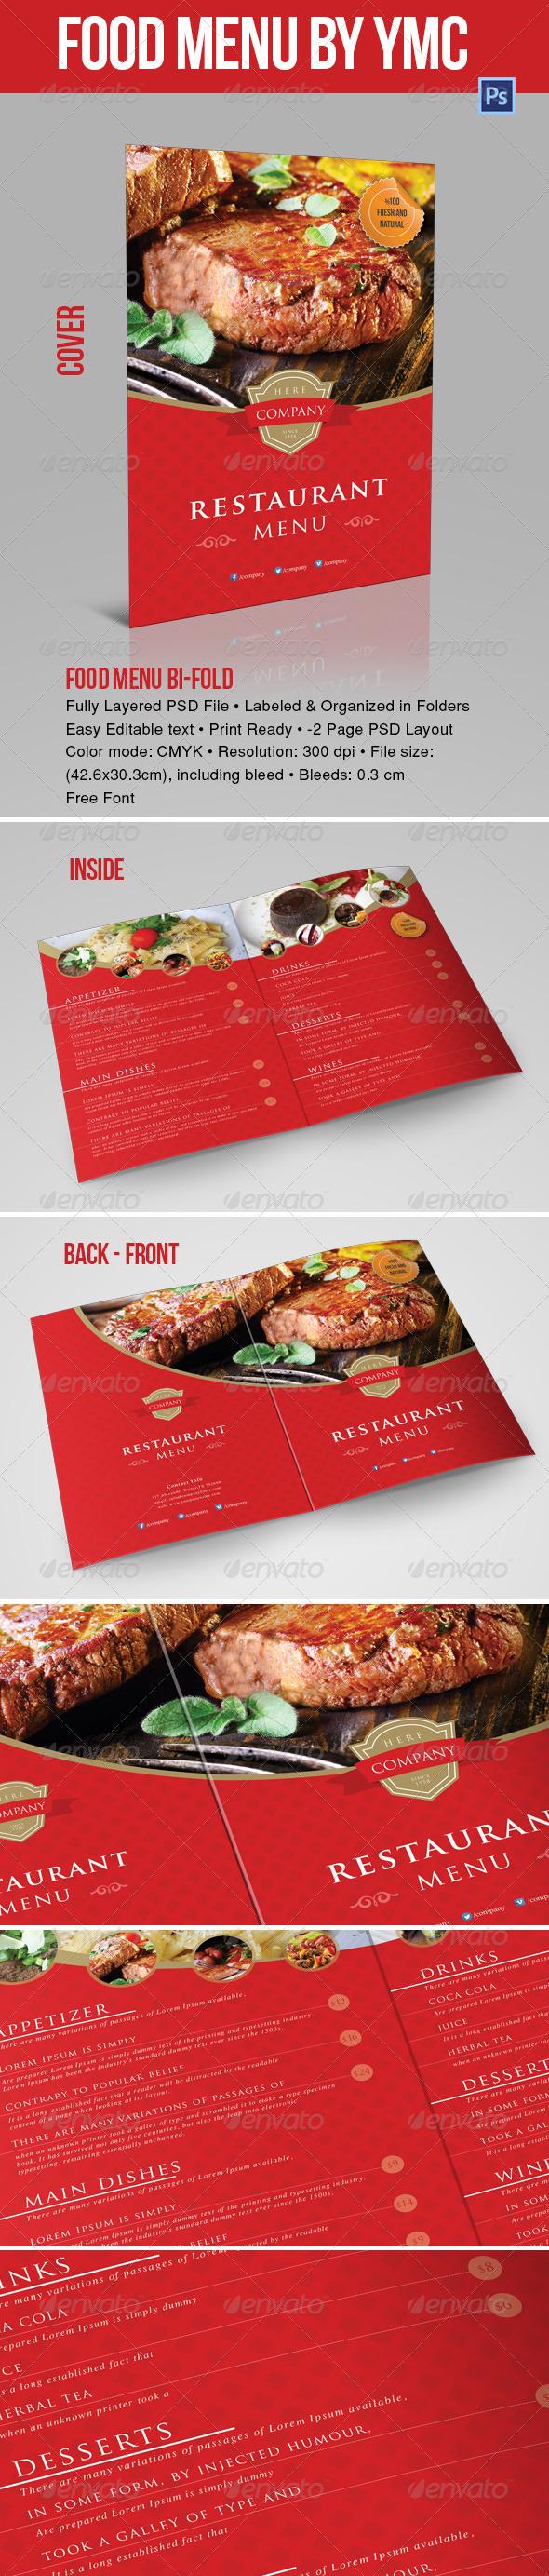 Food Menu Bi-Fold YMC Design - Food Menus Print Templates